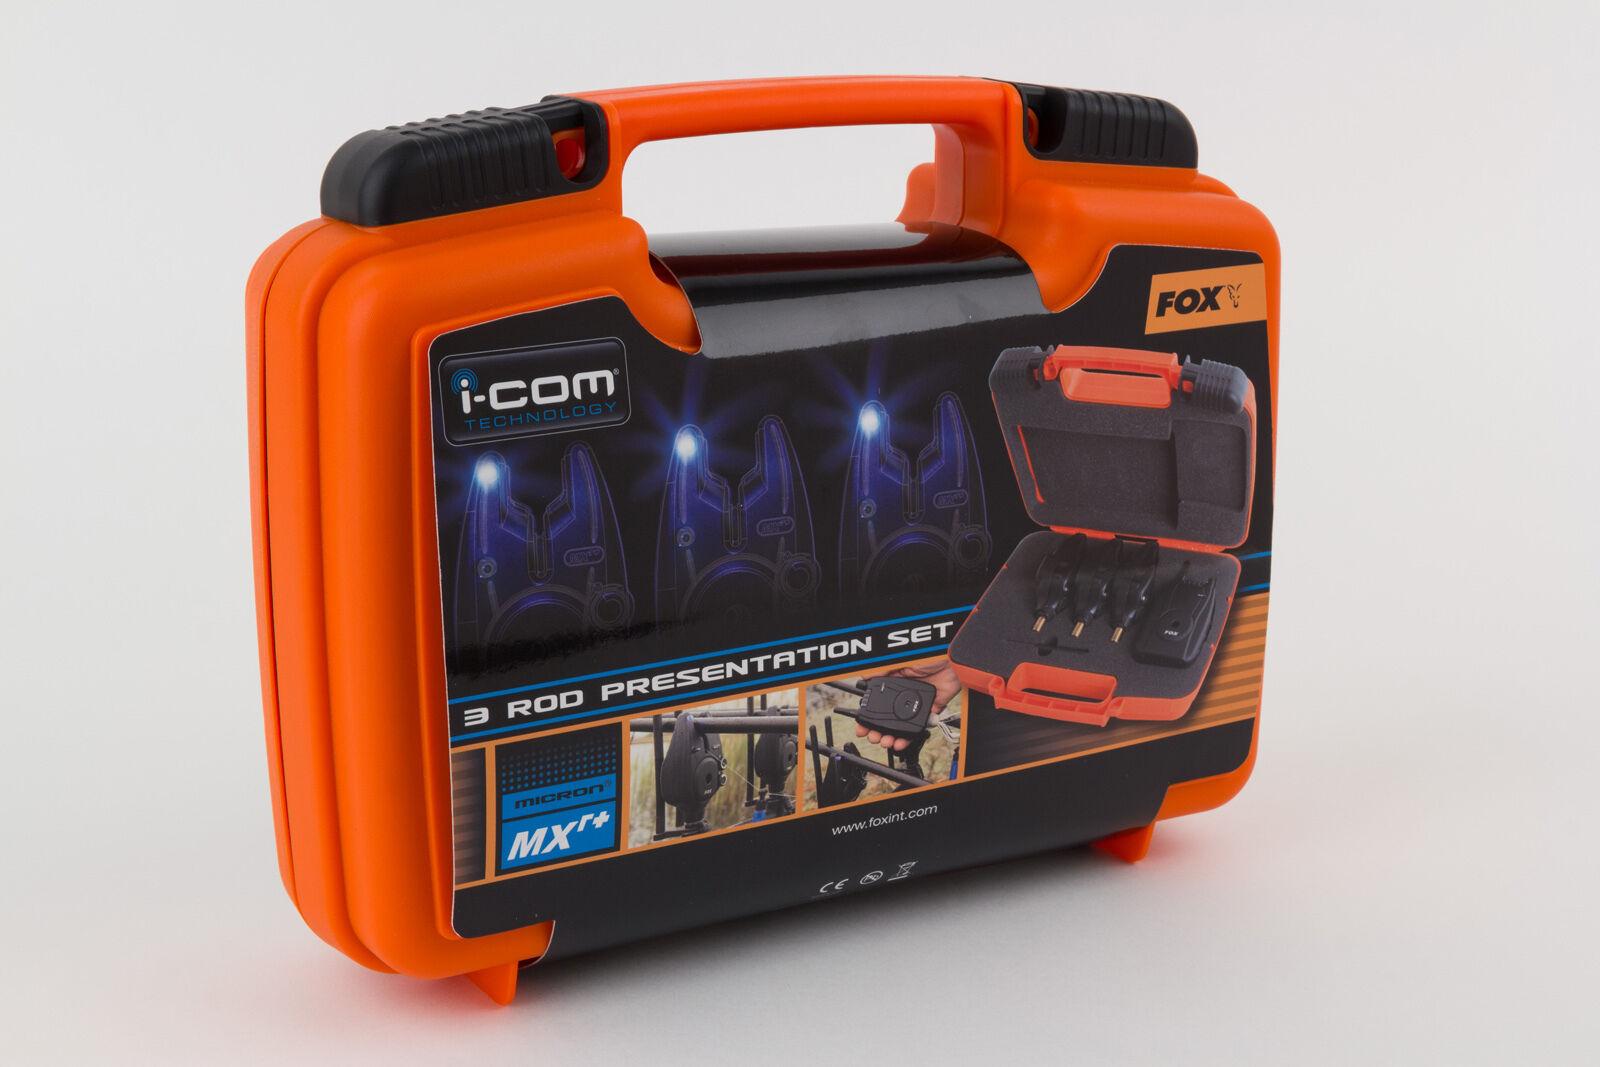 Fox MXR+ Bite Alarm Set - - Set 4 Alarms & Receiver in a Presentation Case Brand New 0dc881